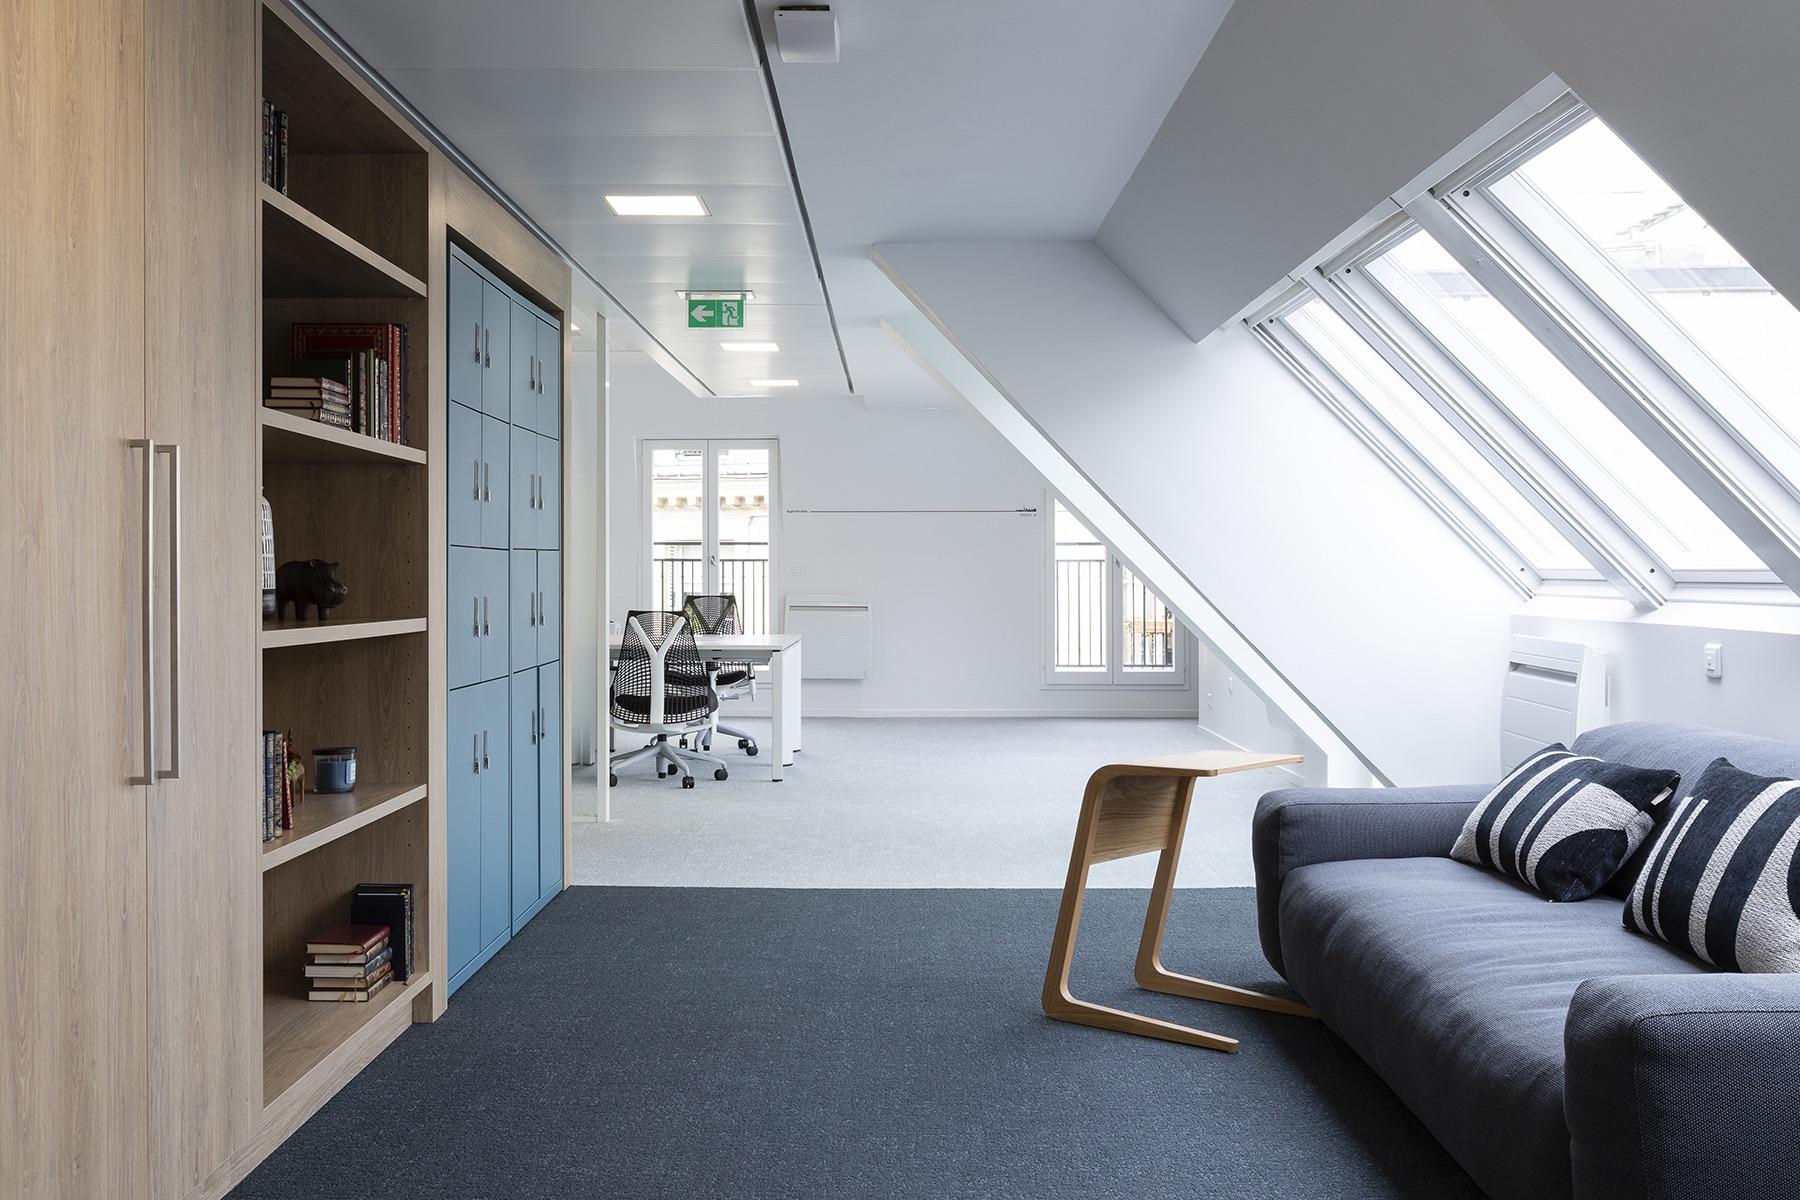 A Look Inside Synchrone's Elegant Paris Office